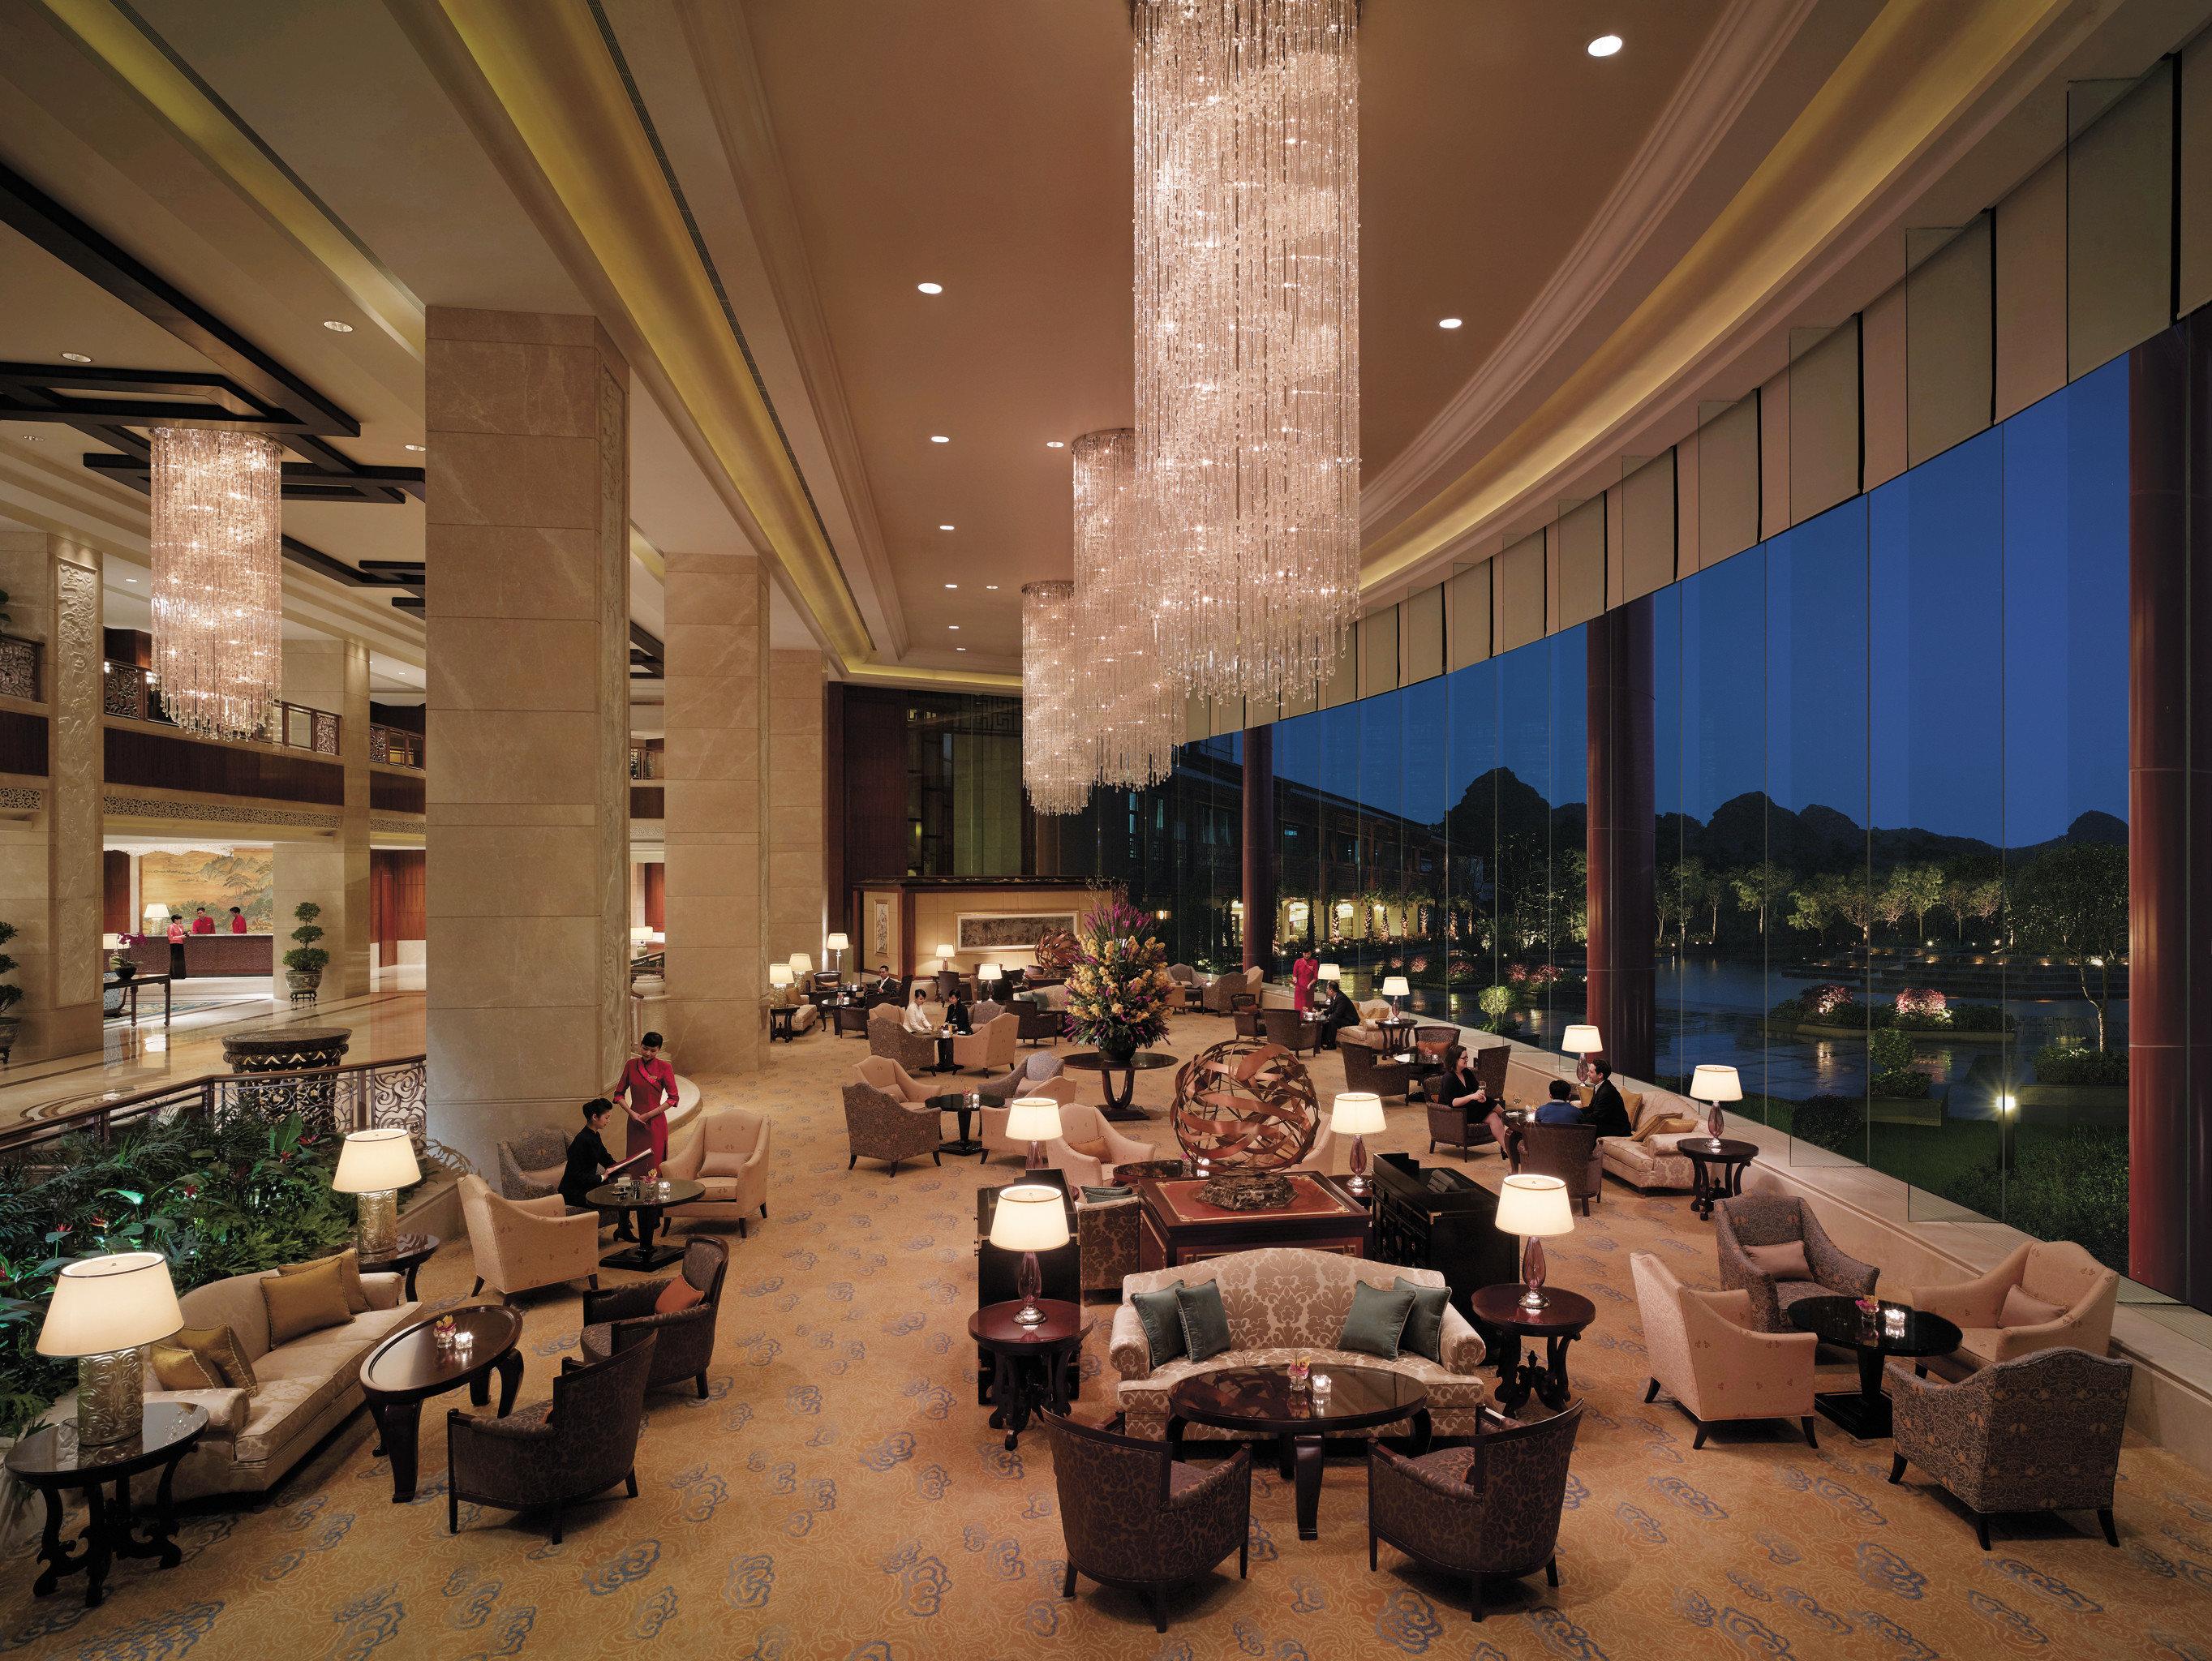 Lounge Luxury Modern Lobby restaurant function hall convention center ballroom